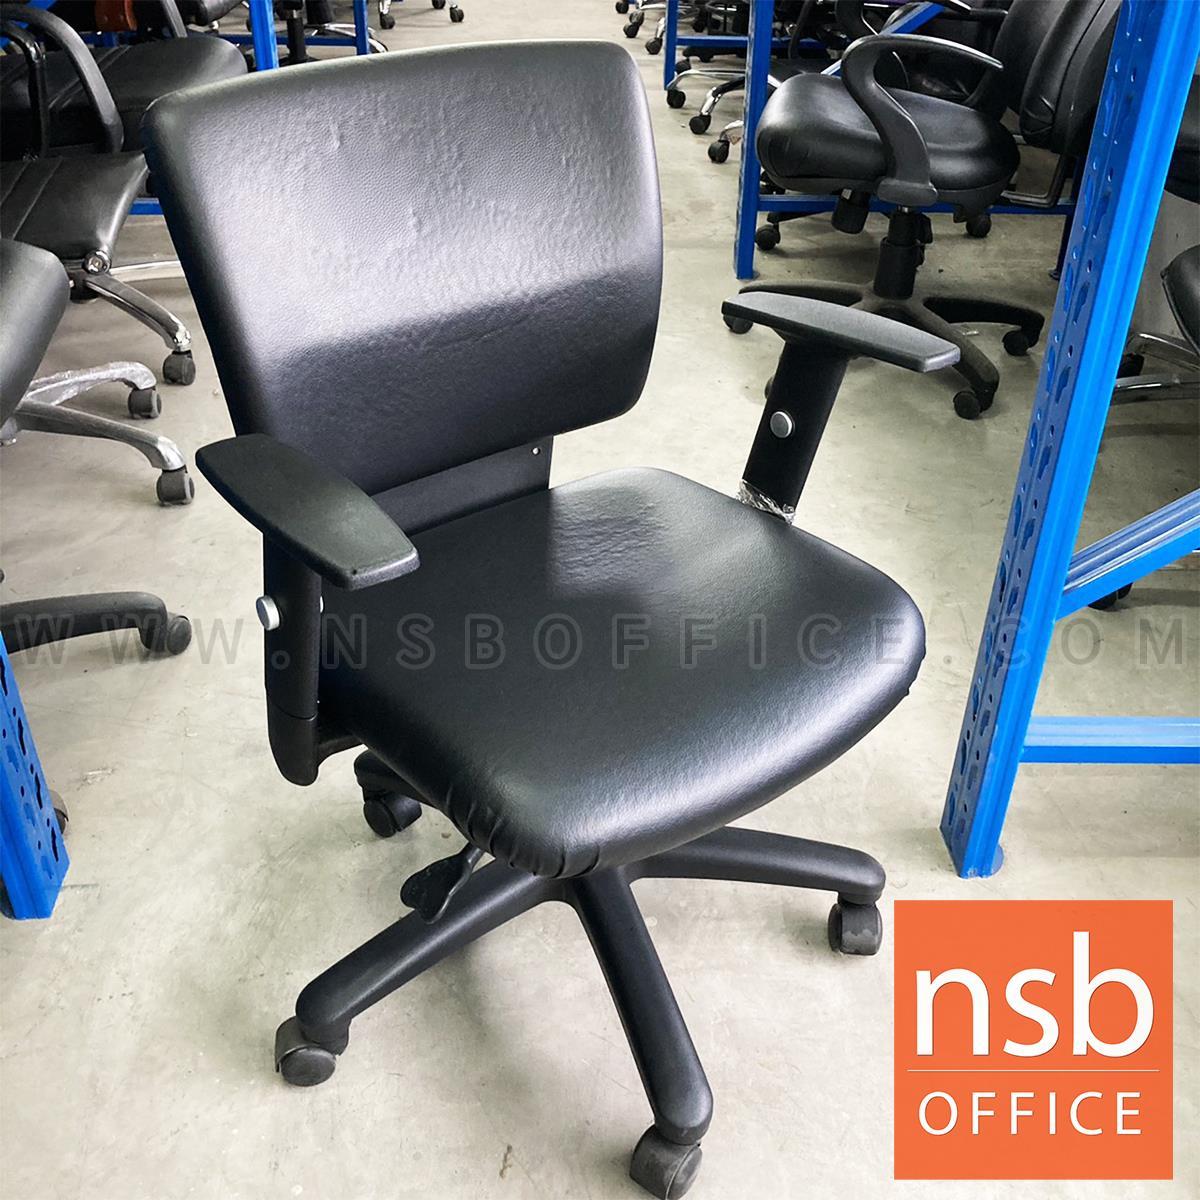 L02A371:เก้าอี้สำนักงาน   โช๊คแก๊ส มีก้อนโยก ขาพลาสติก